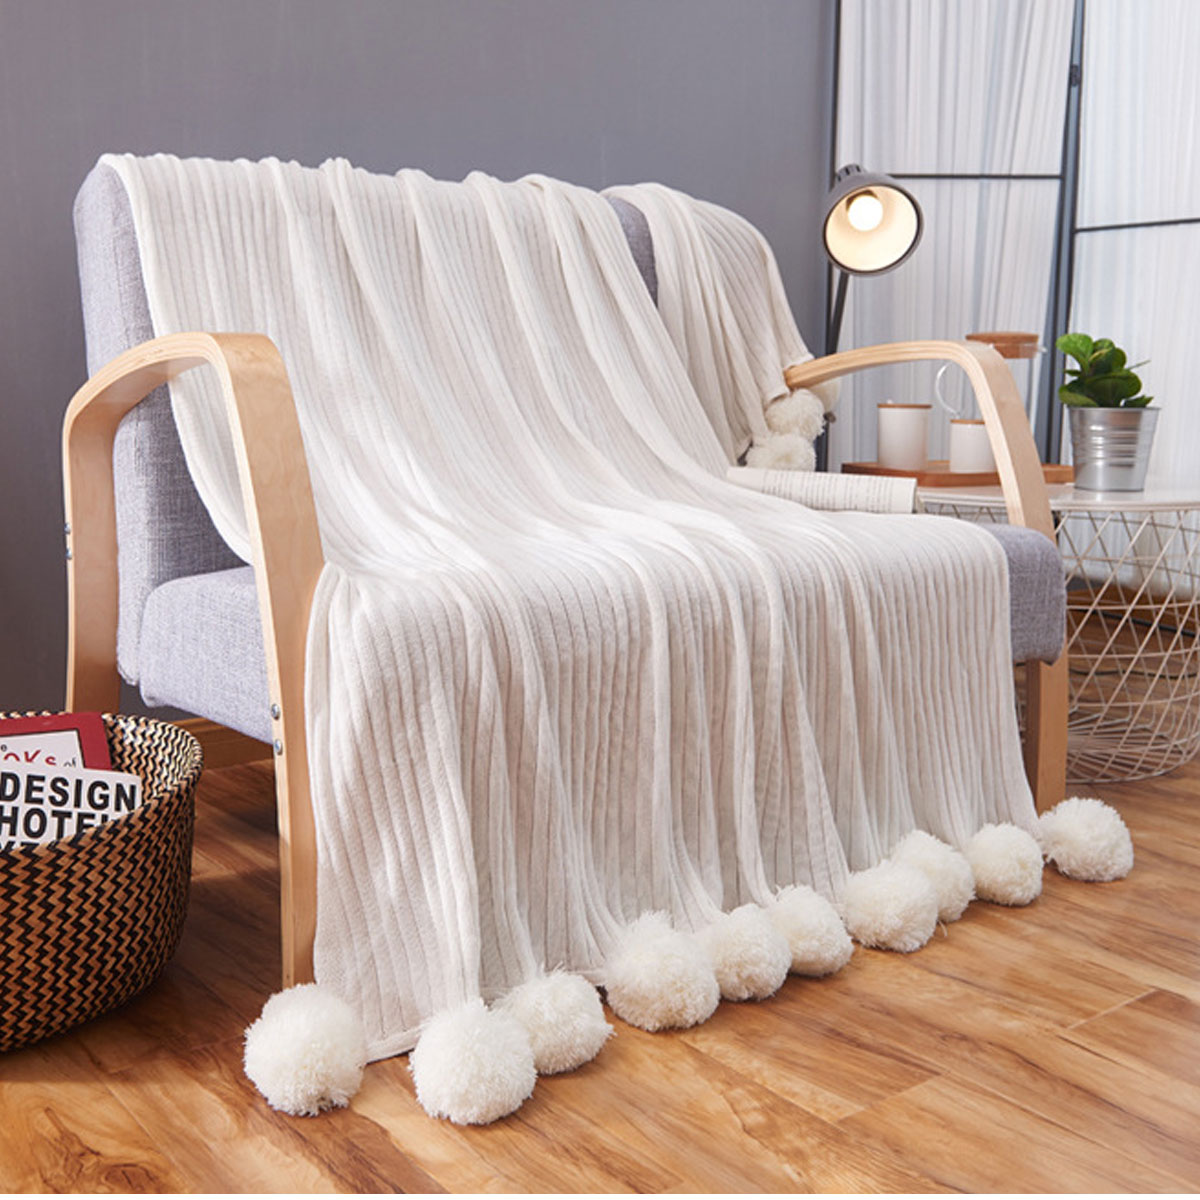 39''x41'' Super Soft Reversible Pom Pom Cotton Knitted Bed Sofa Throw Blanket Baby Crochet Blanket Rug